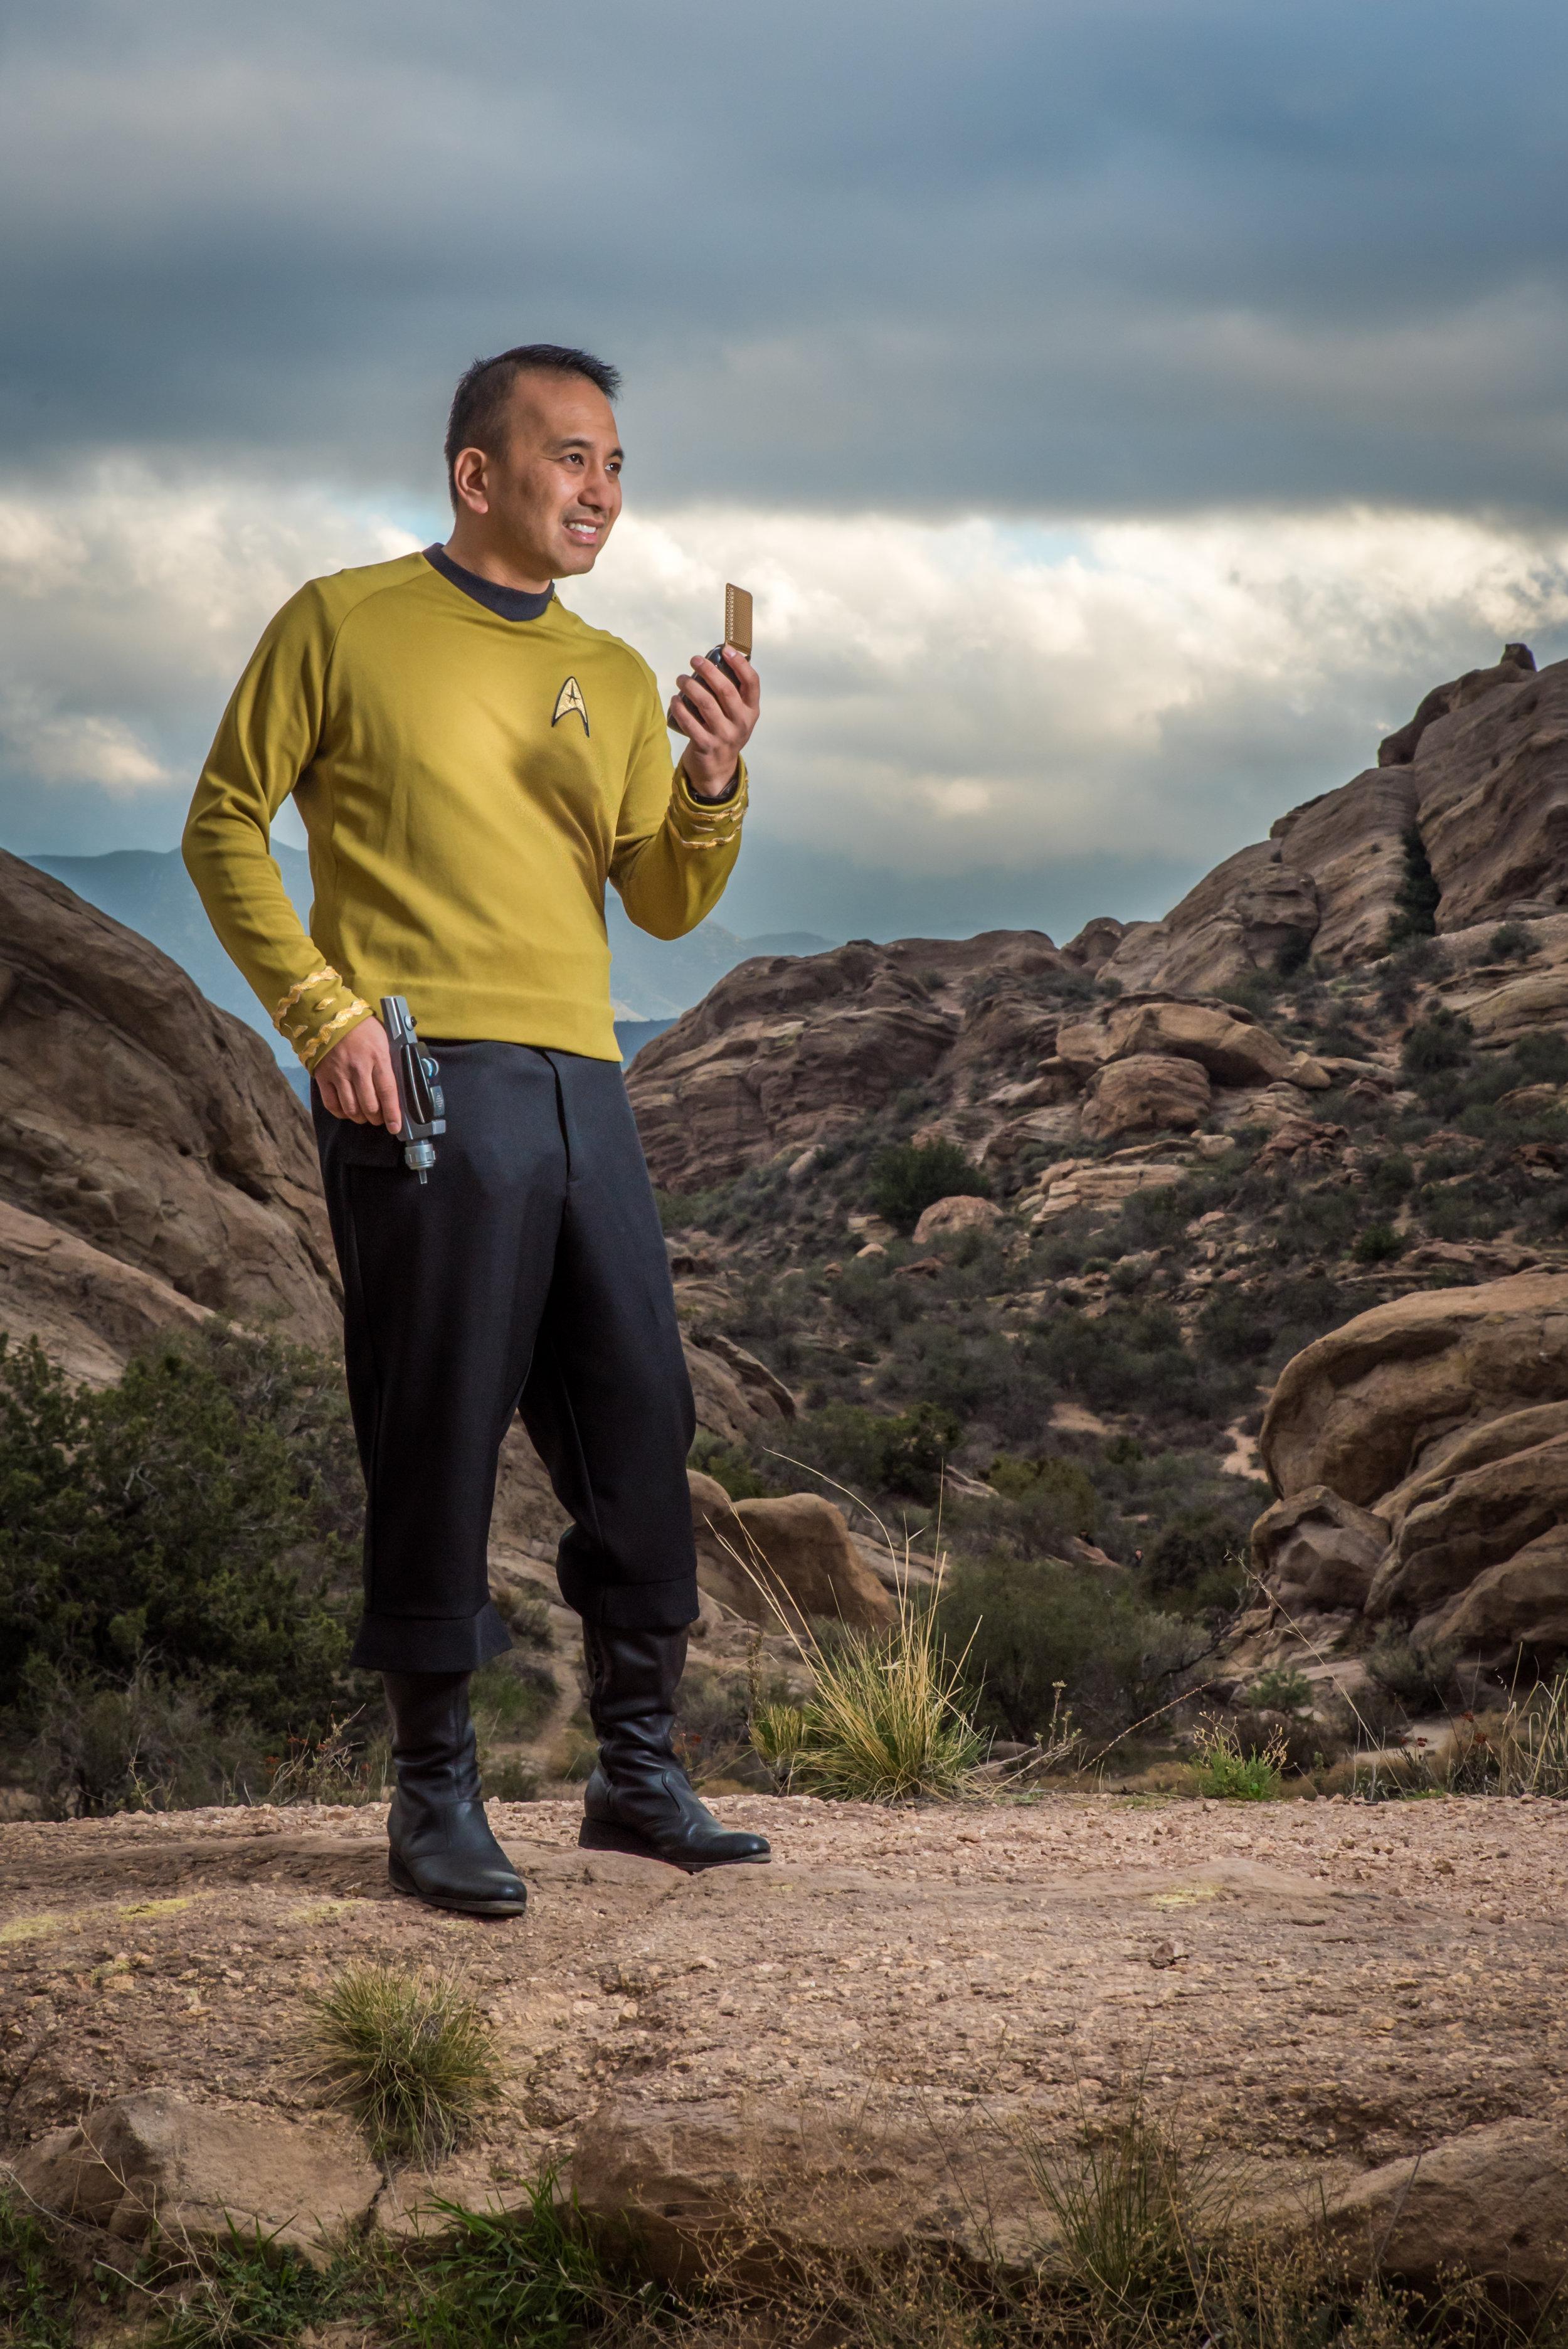 218_2016_January_30-Vasquez_Rocks_David_Lee_Star_Trek-15339-Edit.jpg